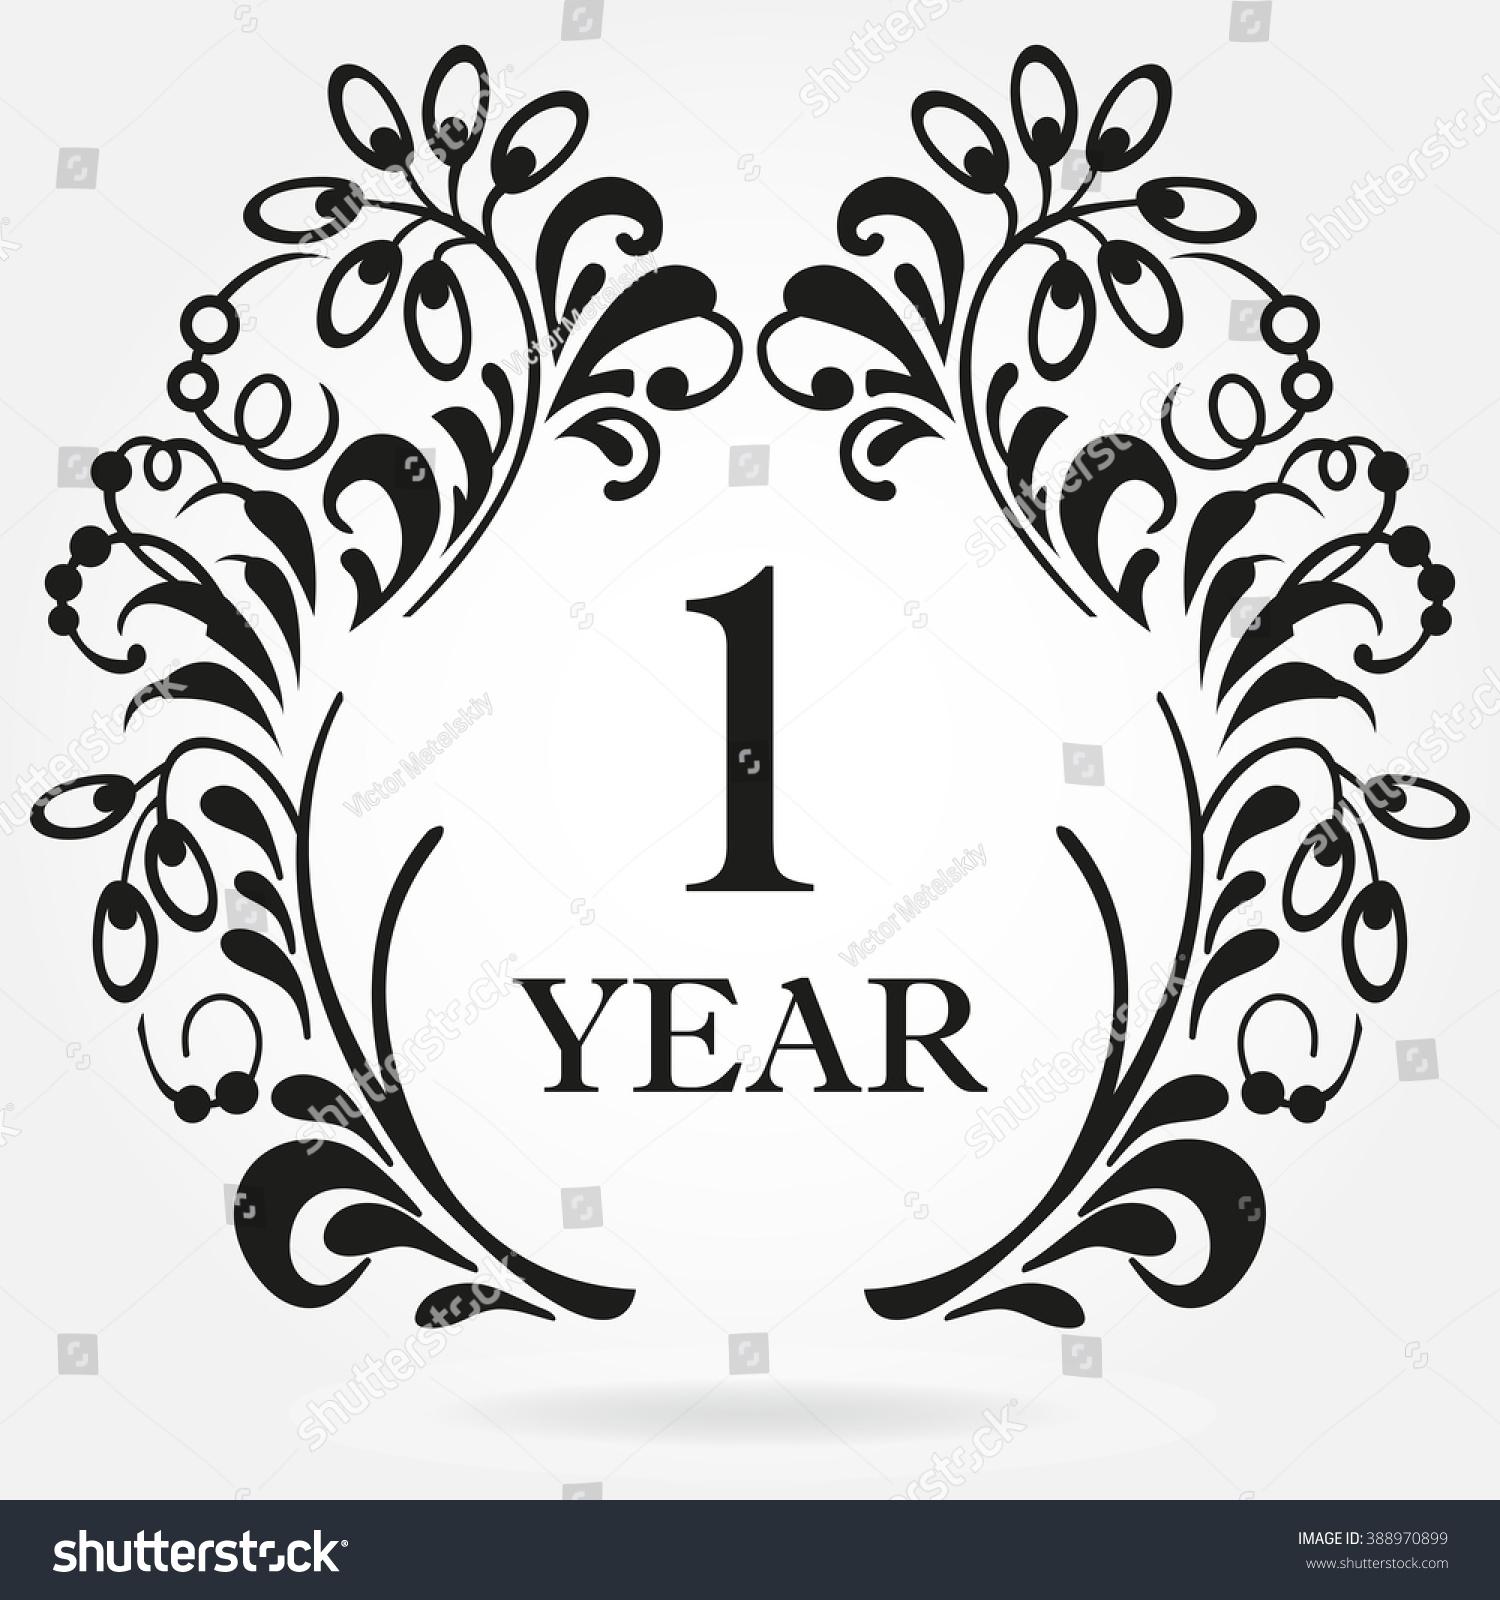 1 Year Anniversary Icon Ornate Frame Stock Illustration 388970899 ...